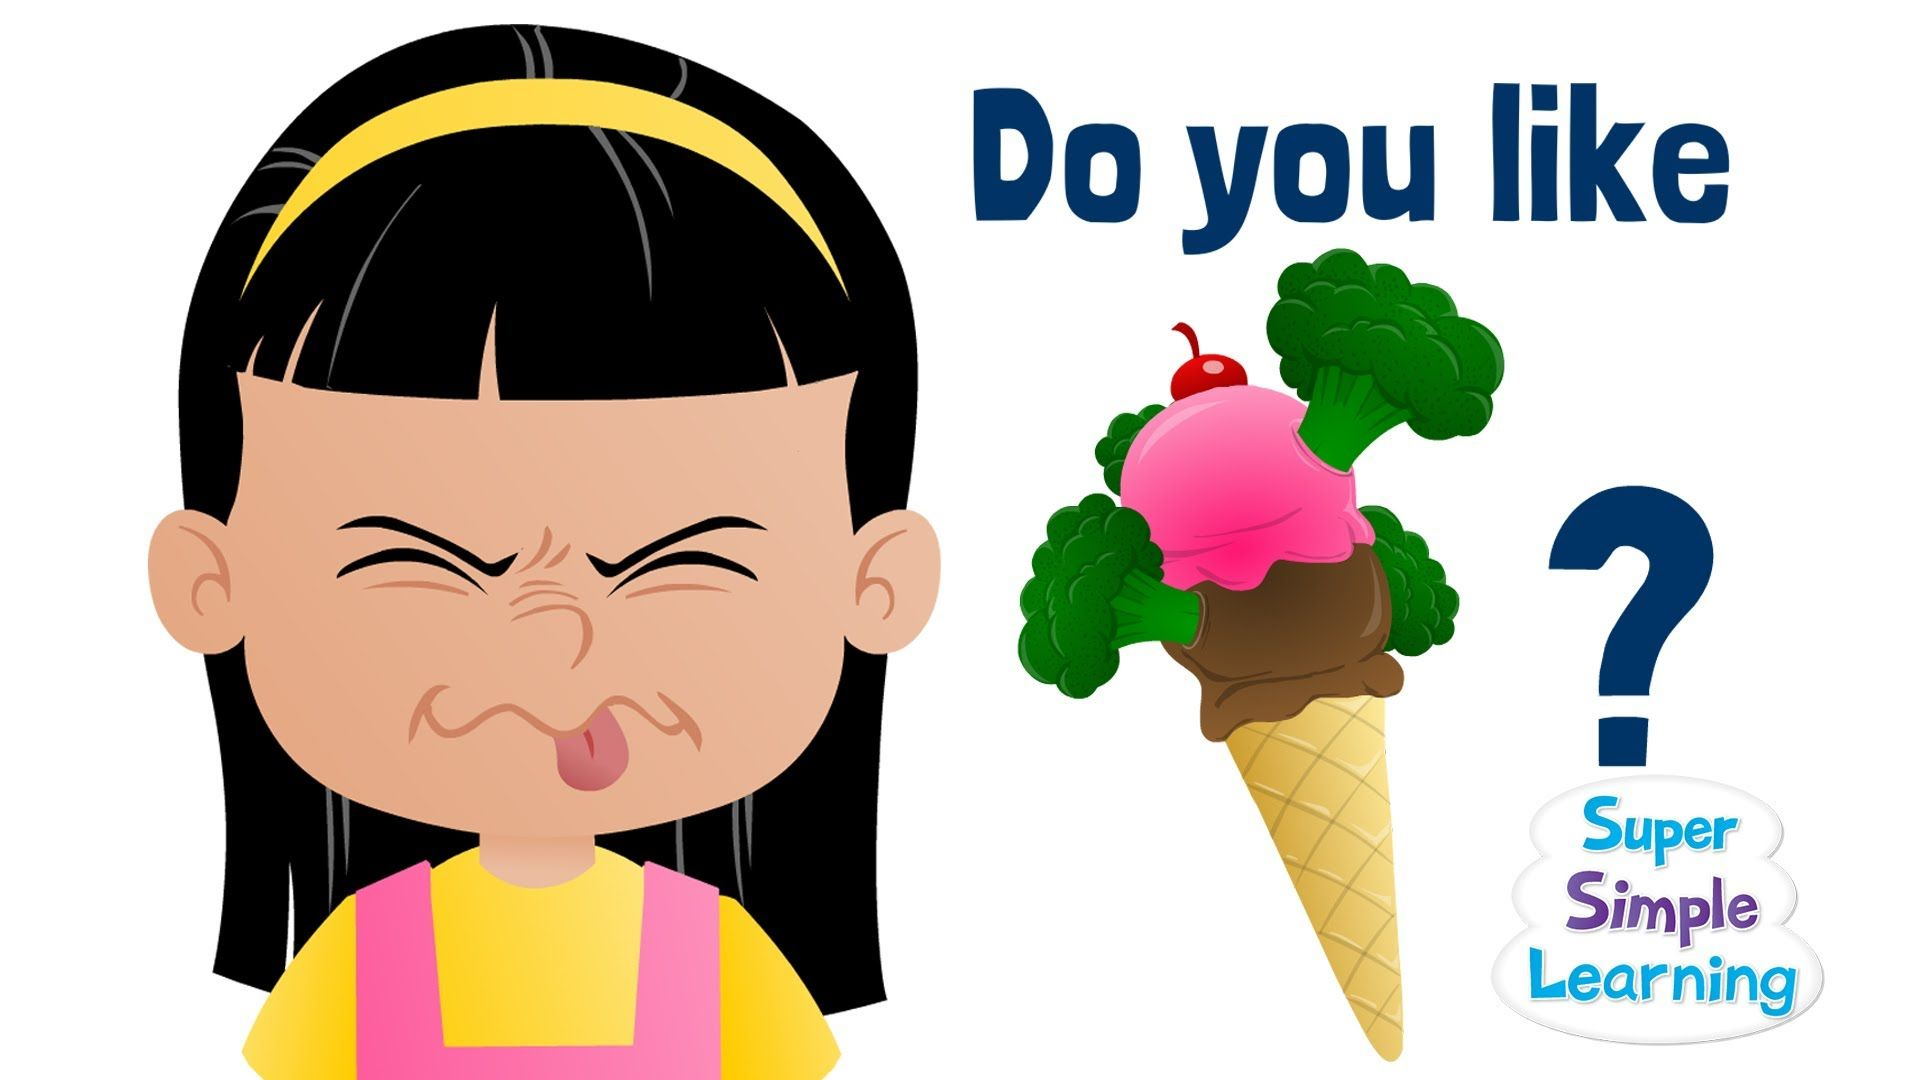 Do You Like Broccoli Ice Cream